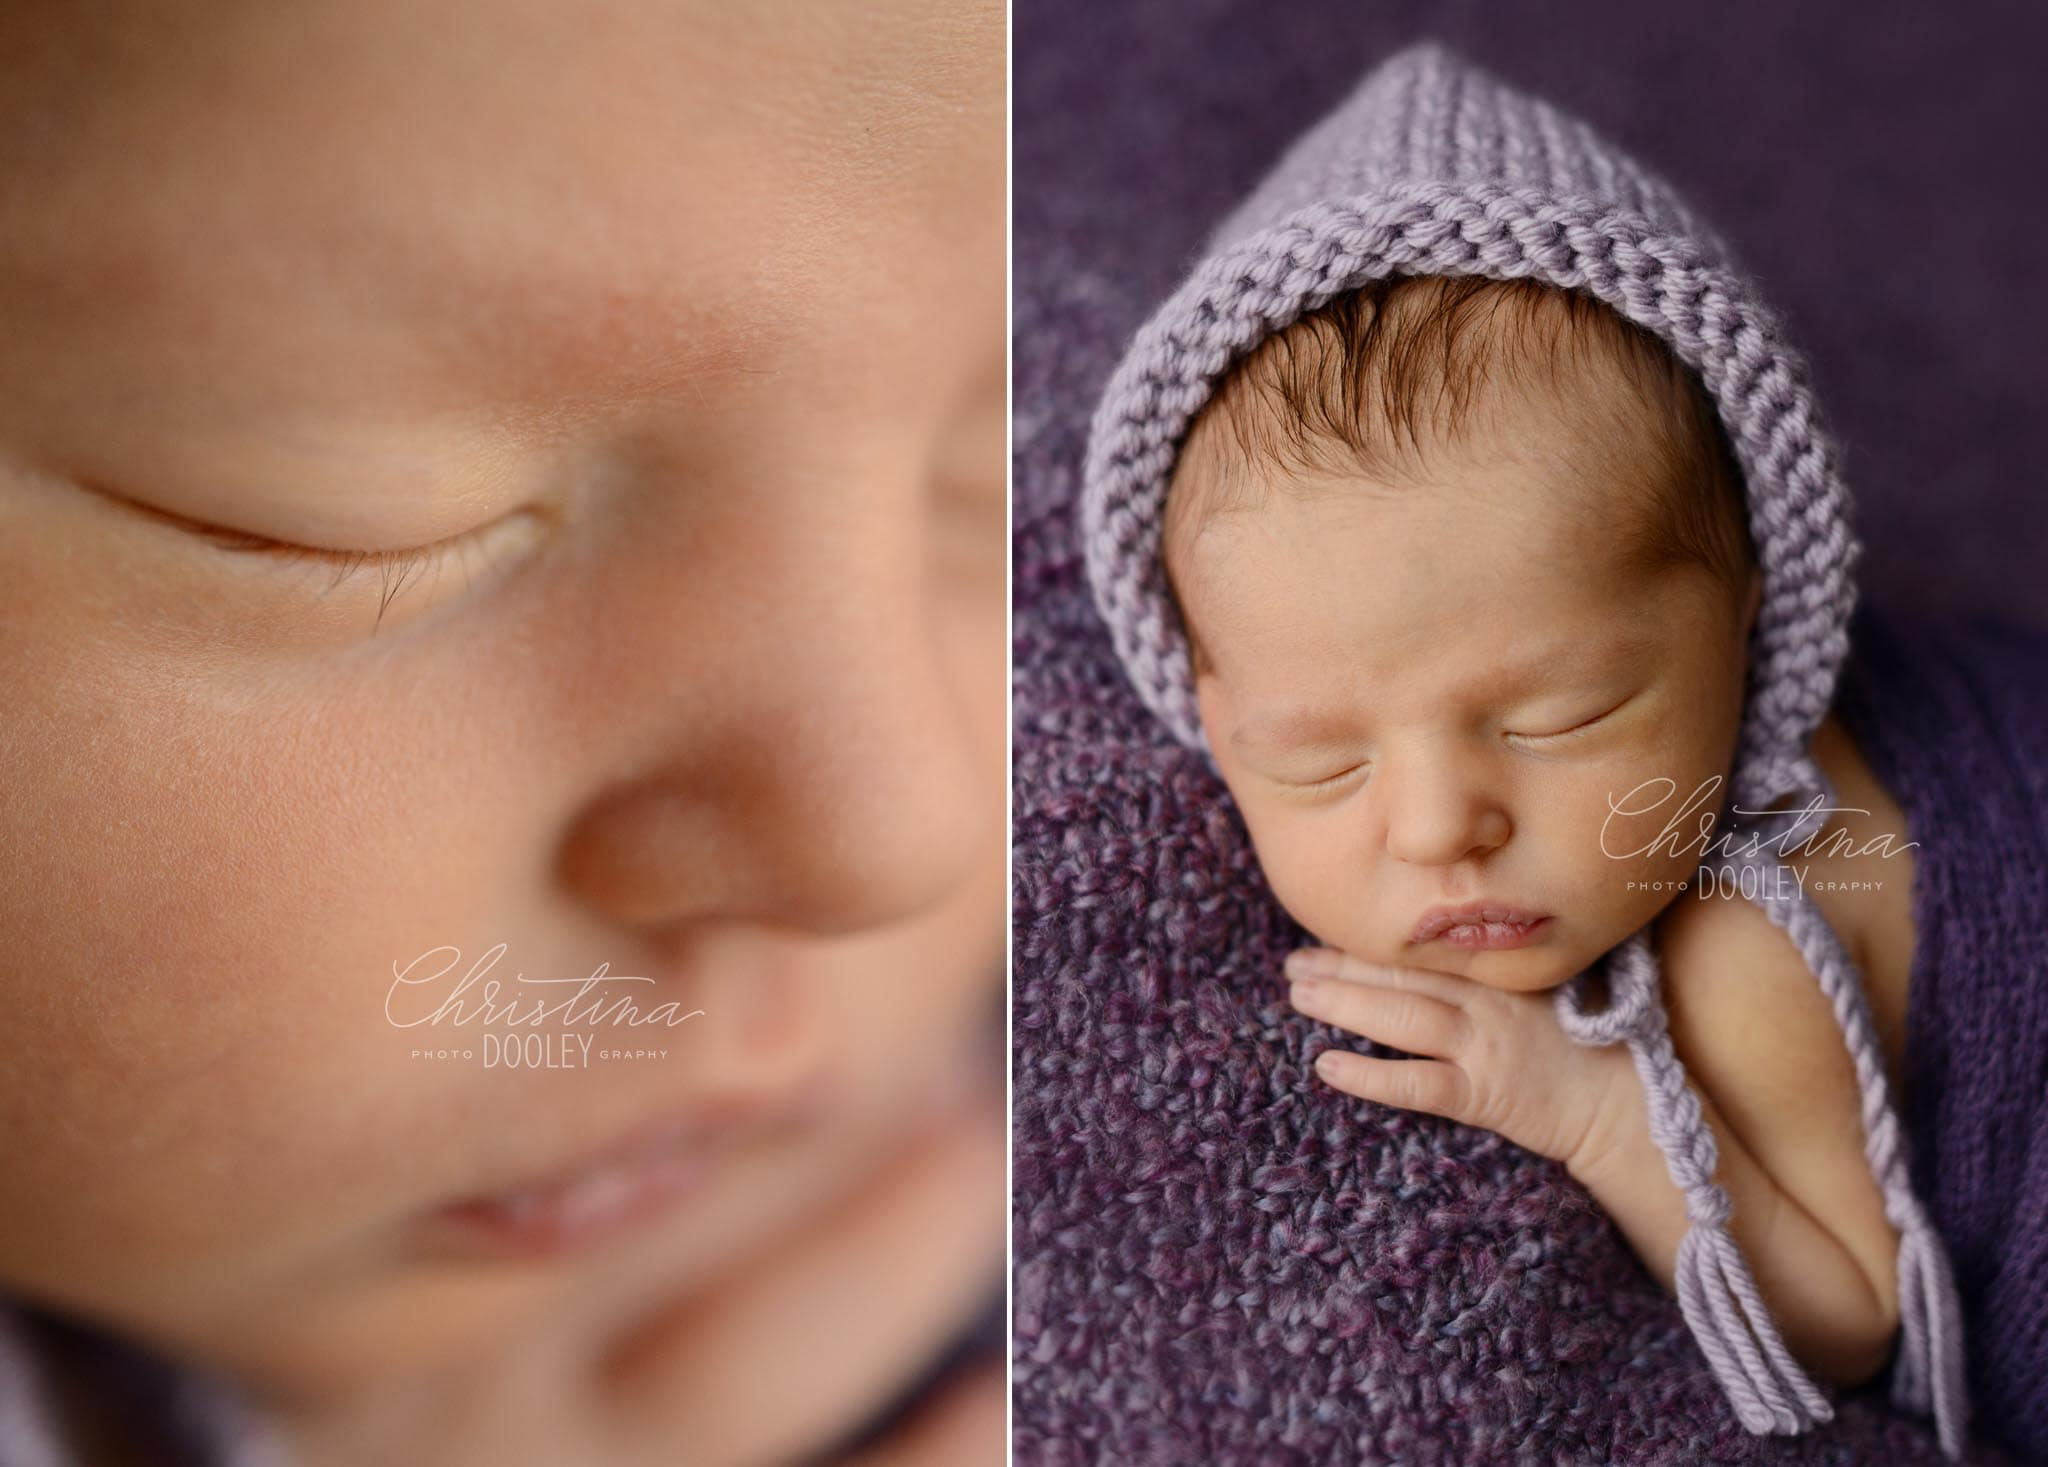 Newborn girl profile photo on knit blanket and baby close up of eyelashes